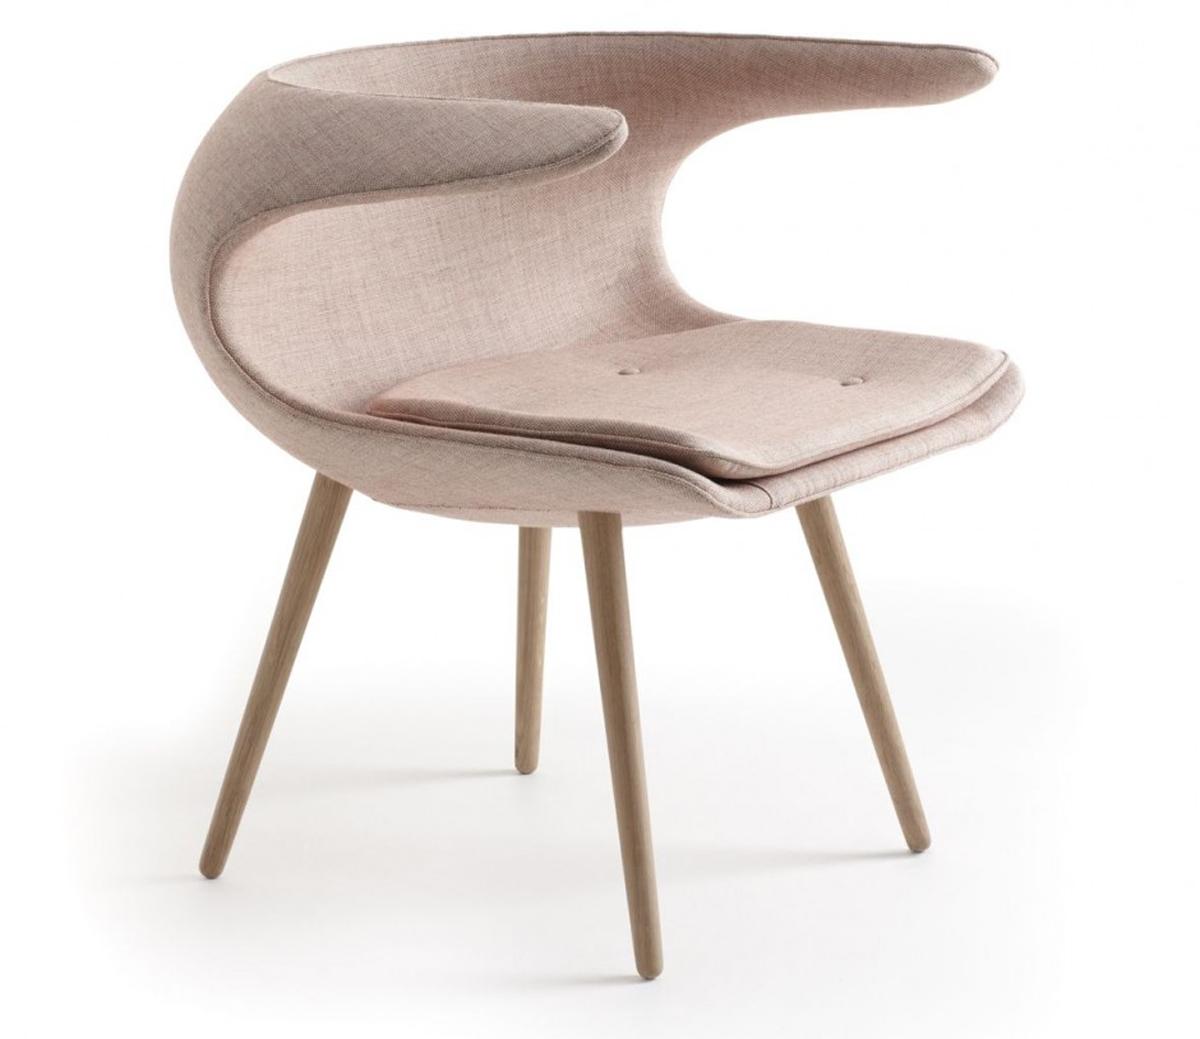 Modern Furniture Austin austin bedroom furniture. modern furniture store austin